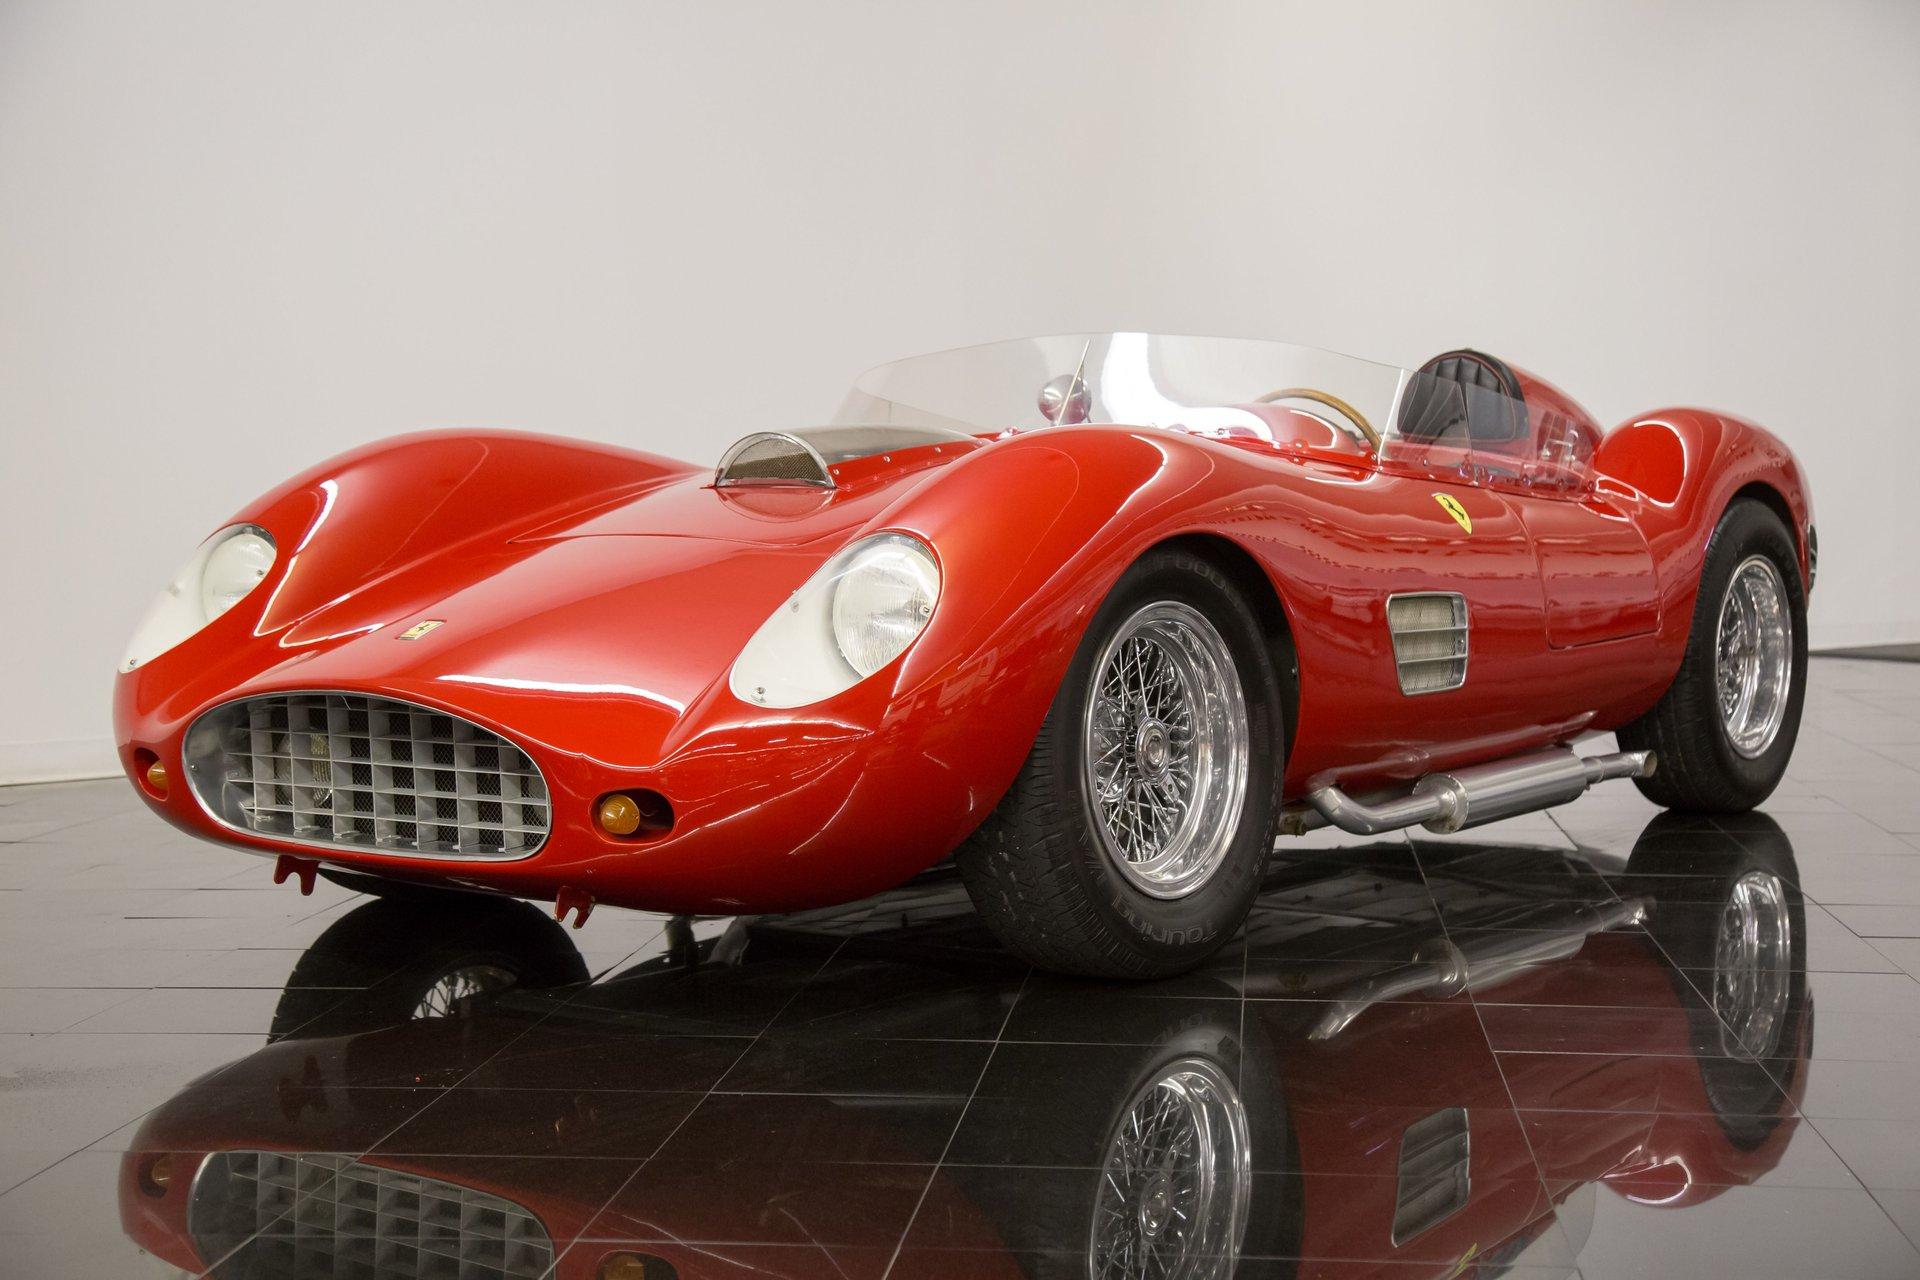 1959 Ferrari 196S Dino Fantuzzi Spyder For Sale